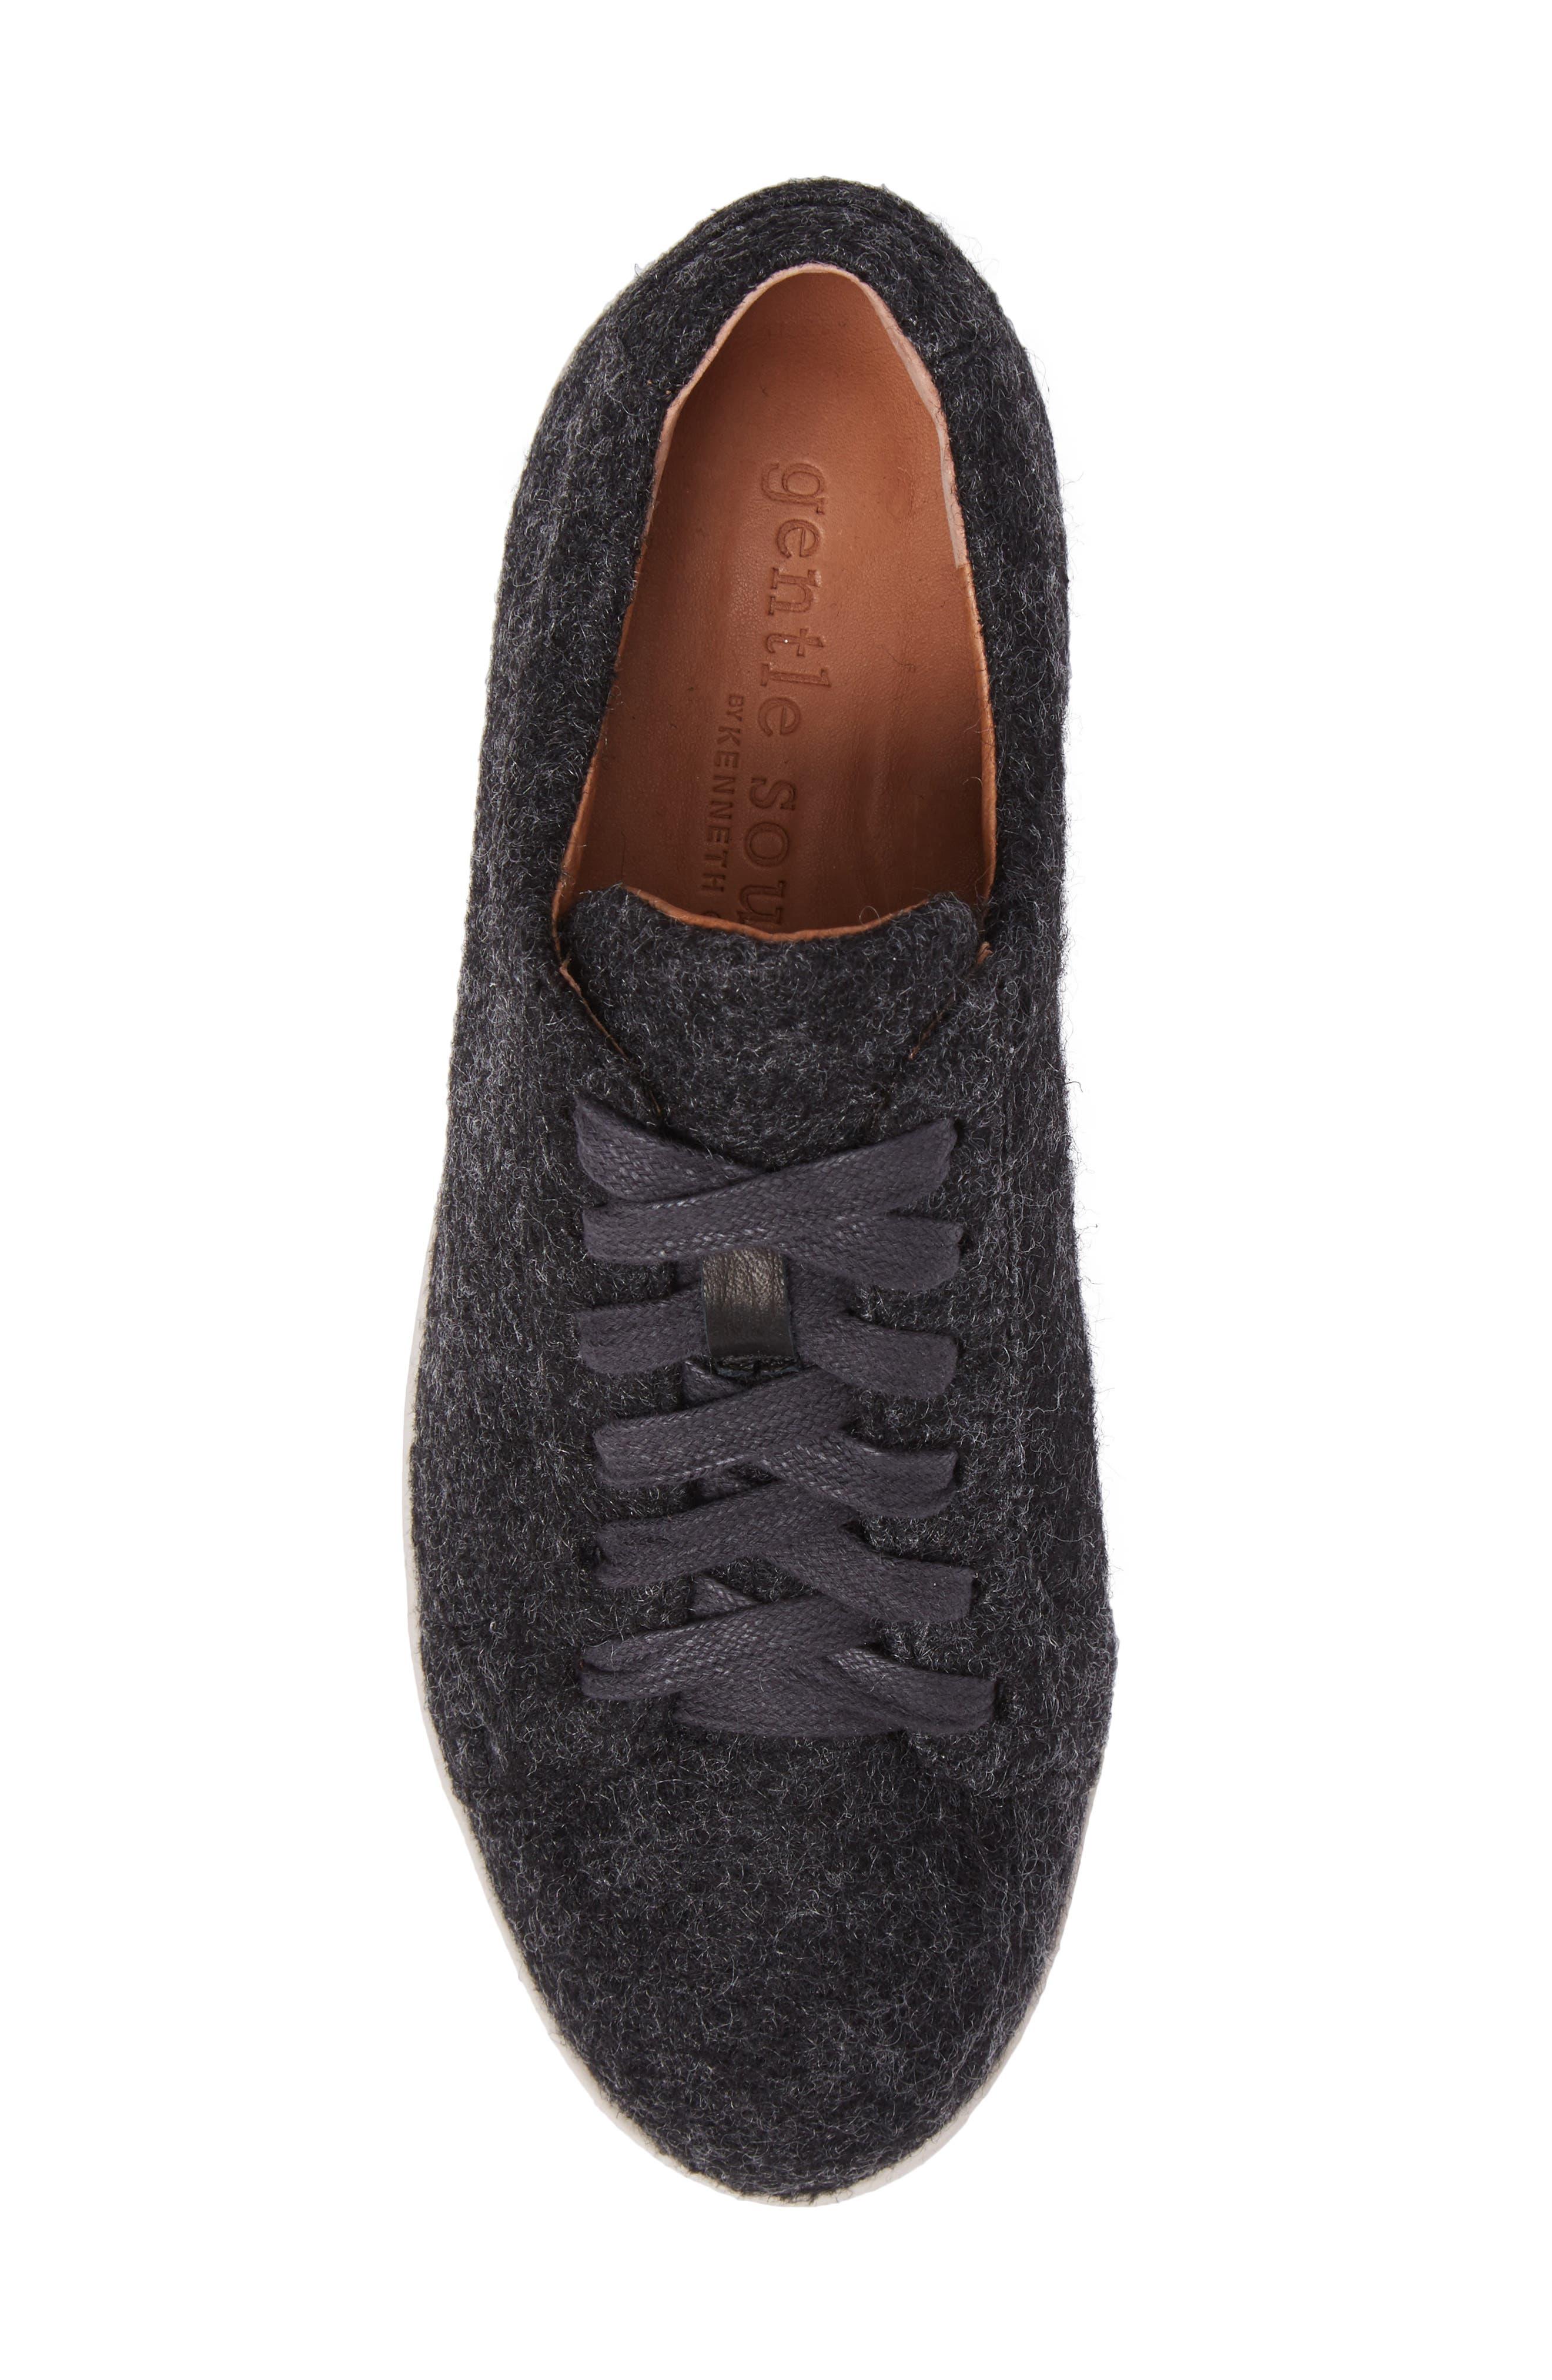 GENTLE SOULS BY KENNETH COLE, Haddie Low Platform Sneaker, Alternate thumbnail 5, color, HEATHER GREY WOOL